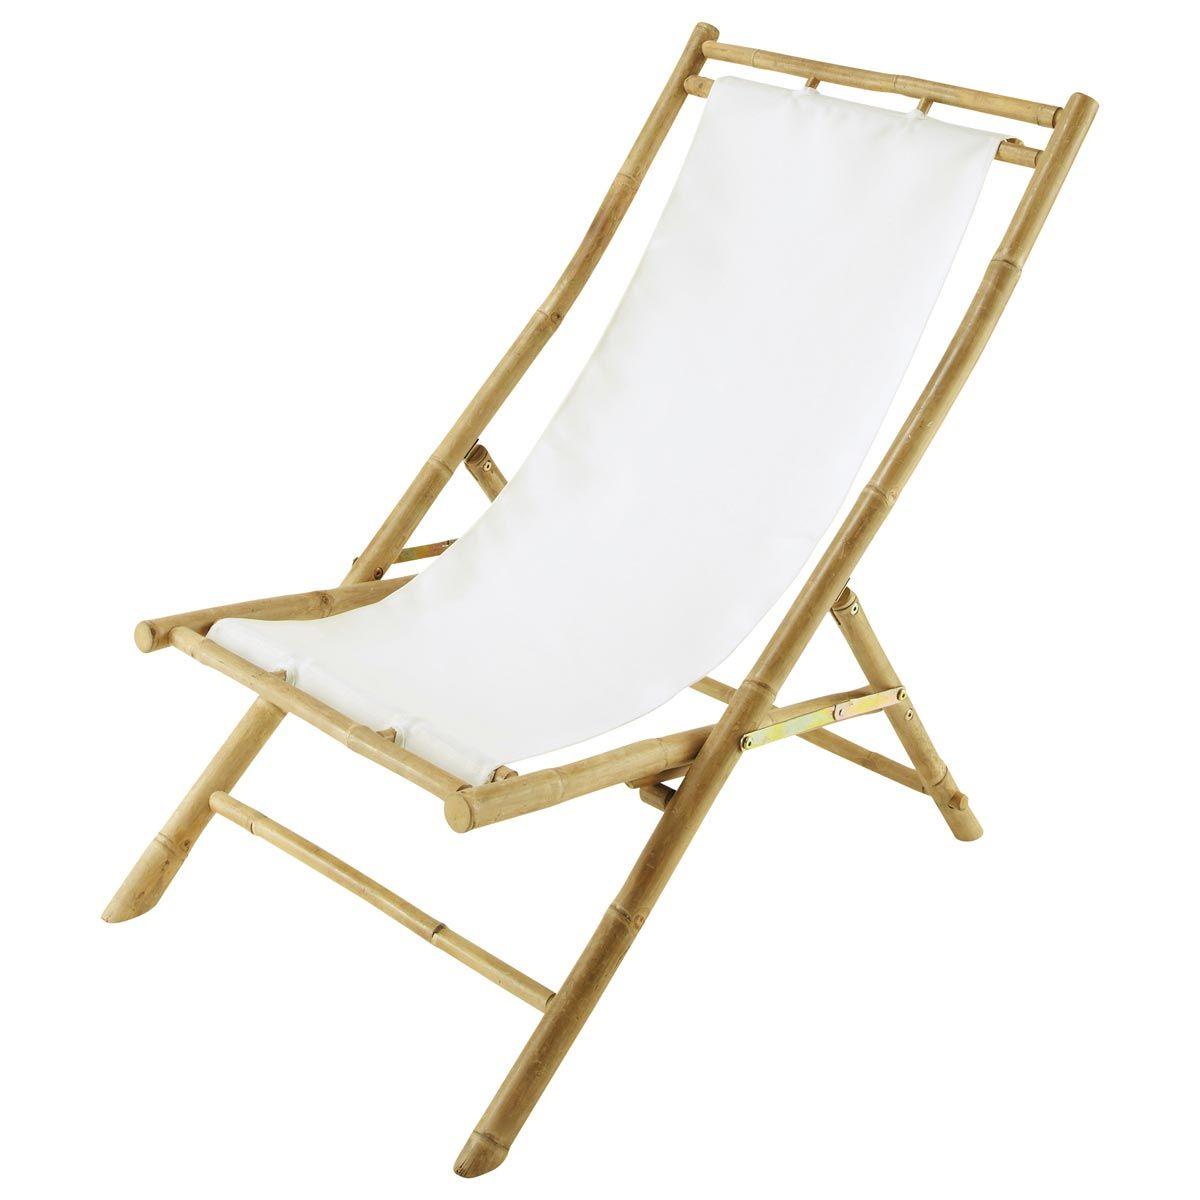 Tumbona silla de playa plegable bamb crudo robinson for Silla tumbona plegable